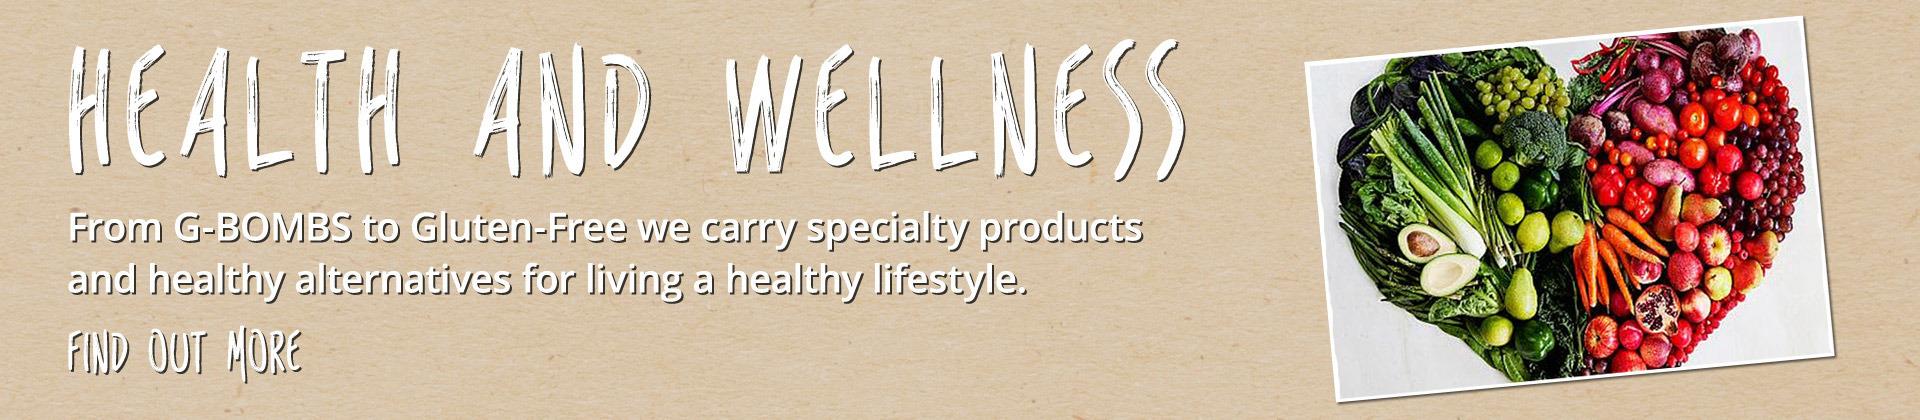 /health-and-wellness